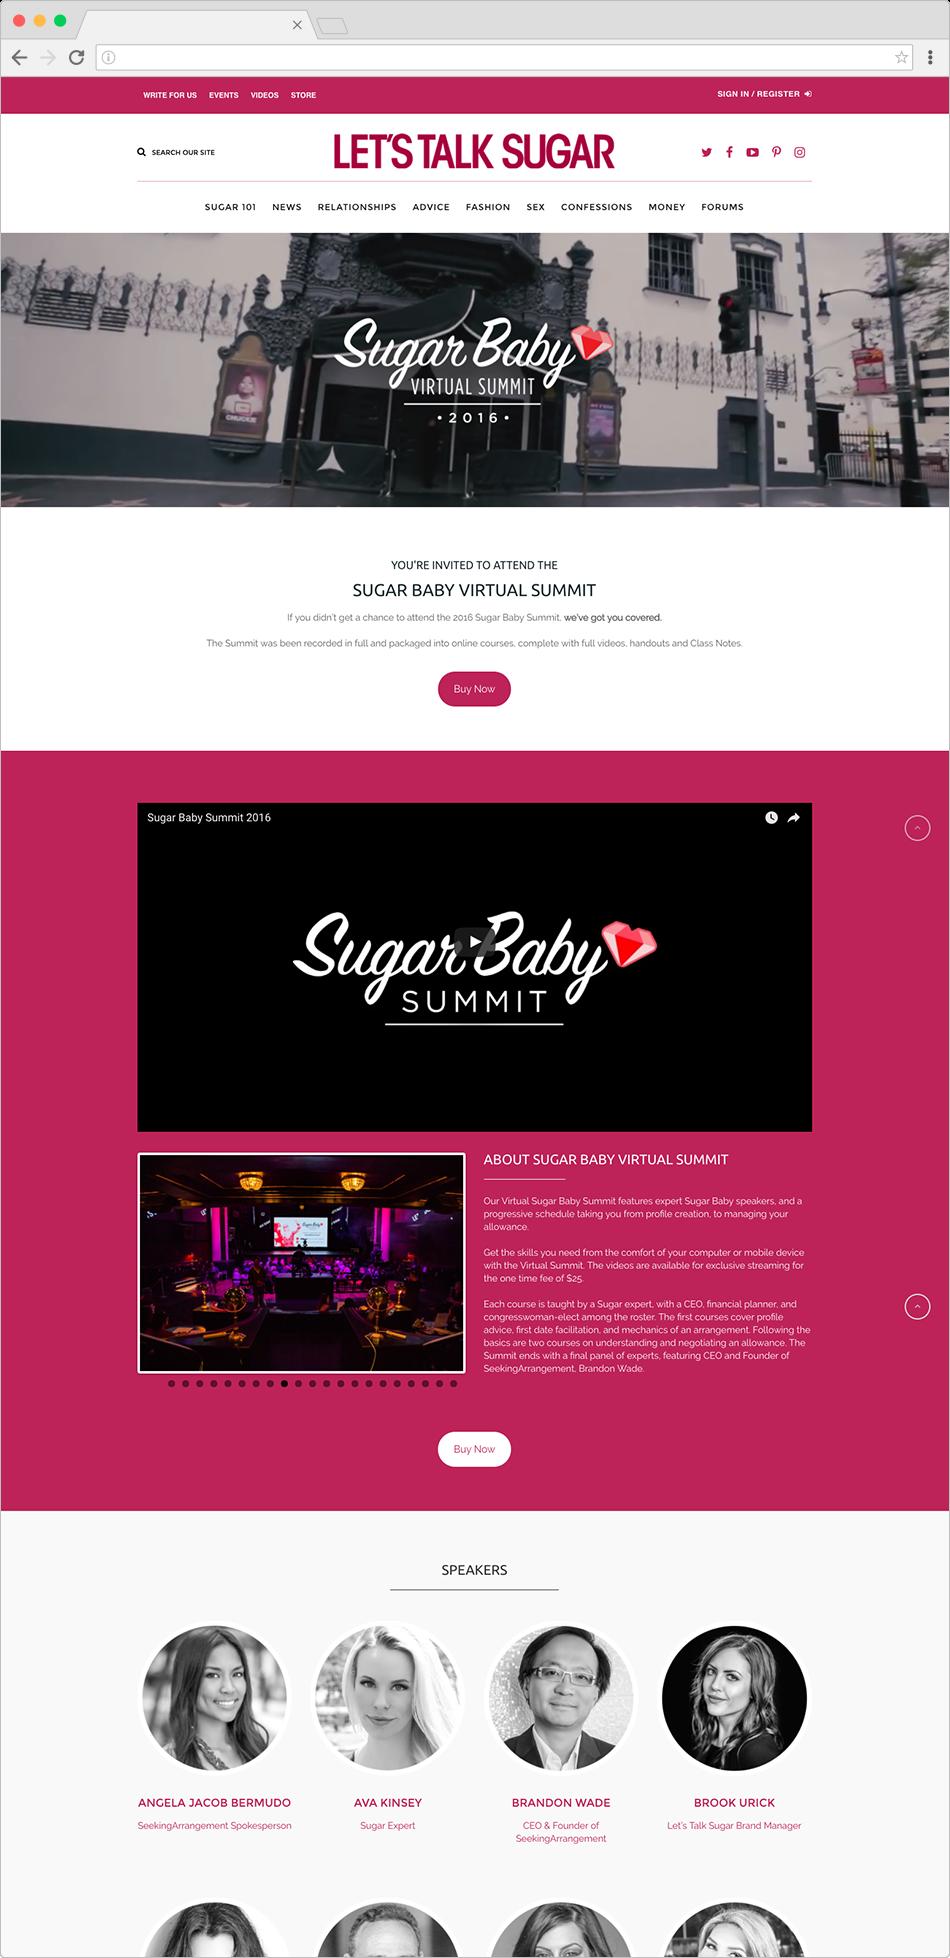 Sugar Baby Virtual Summit